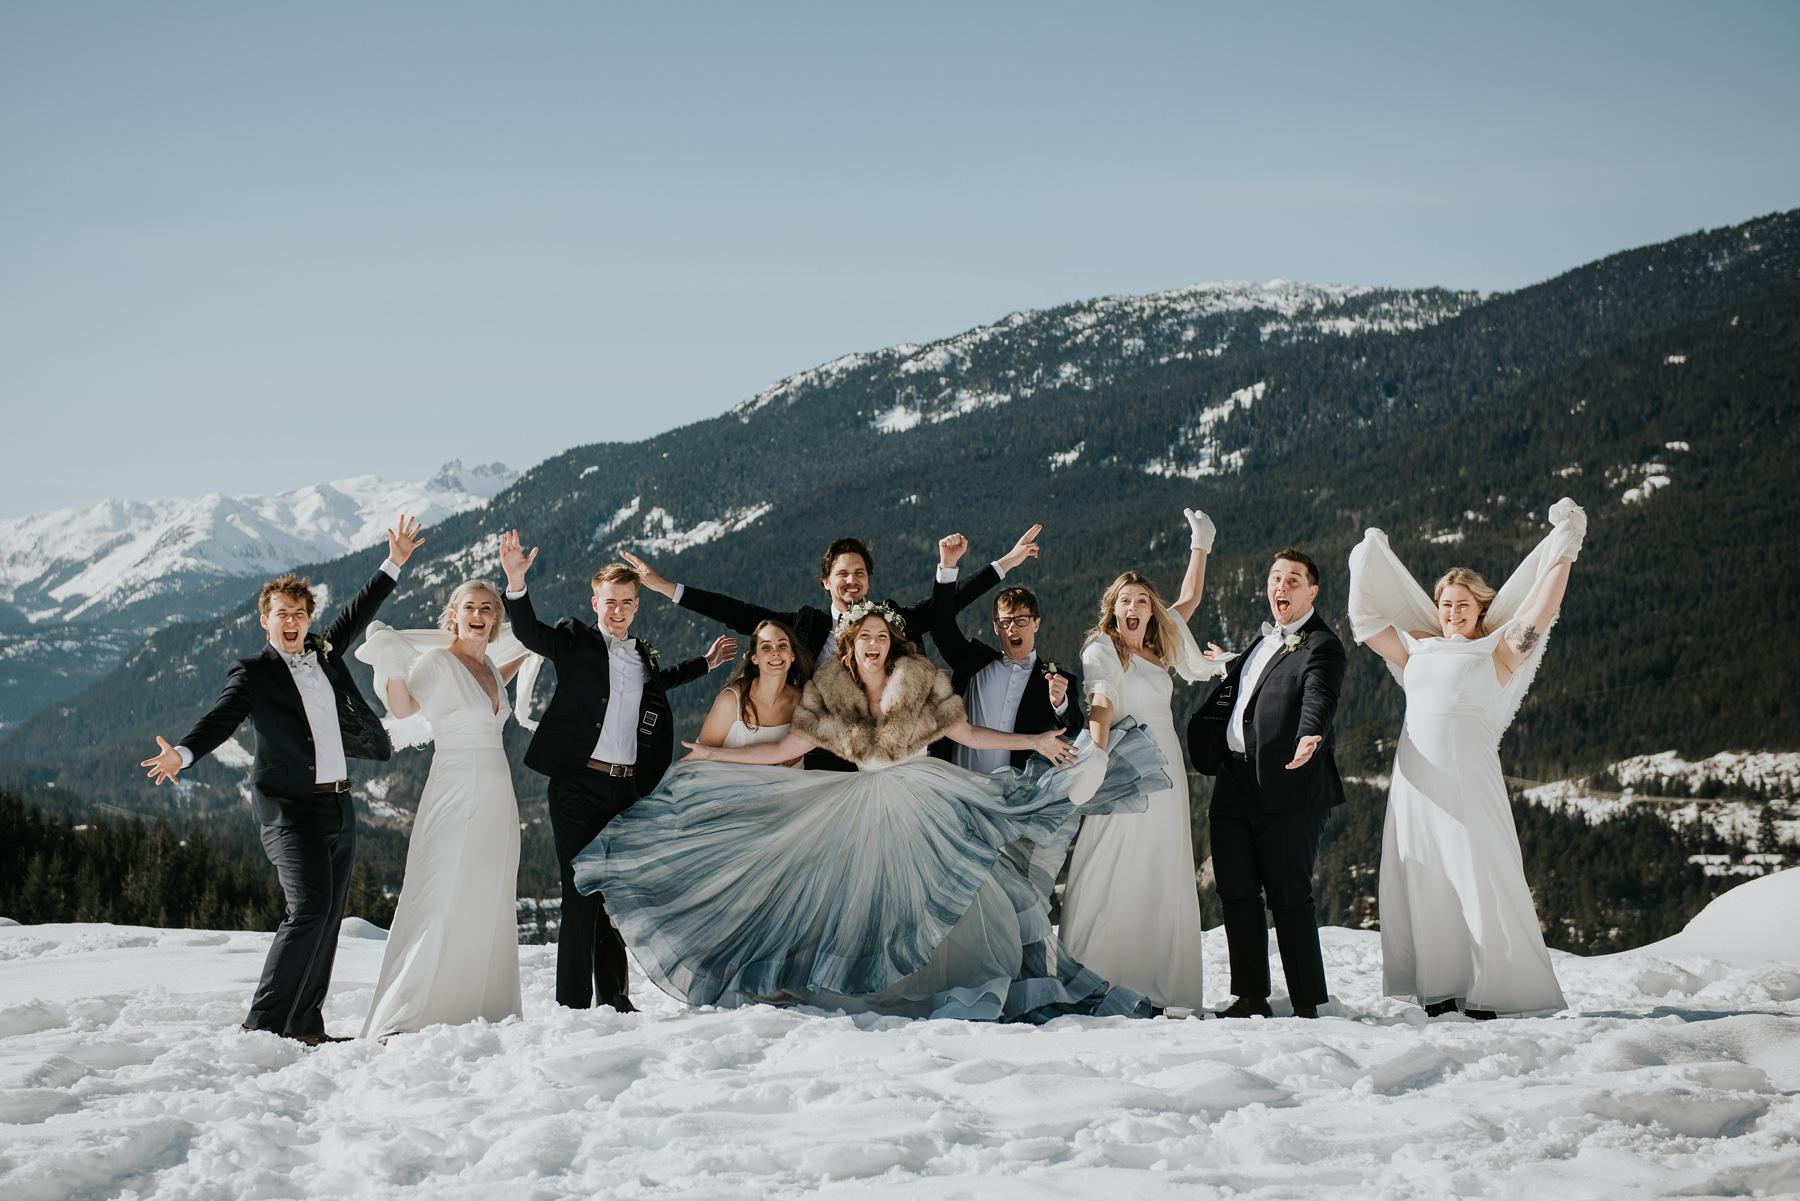 bridal party having fun in winter at Nita lake lodge wedding